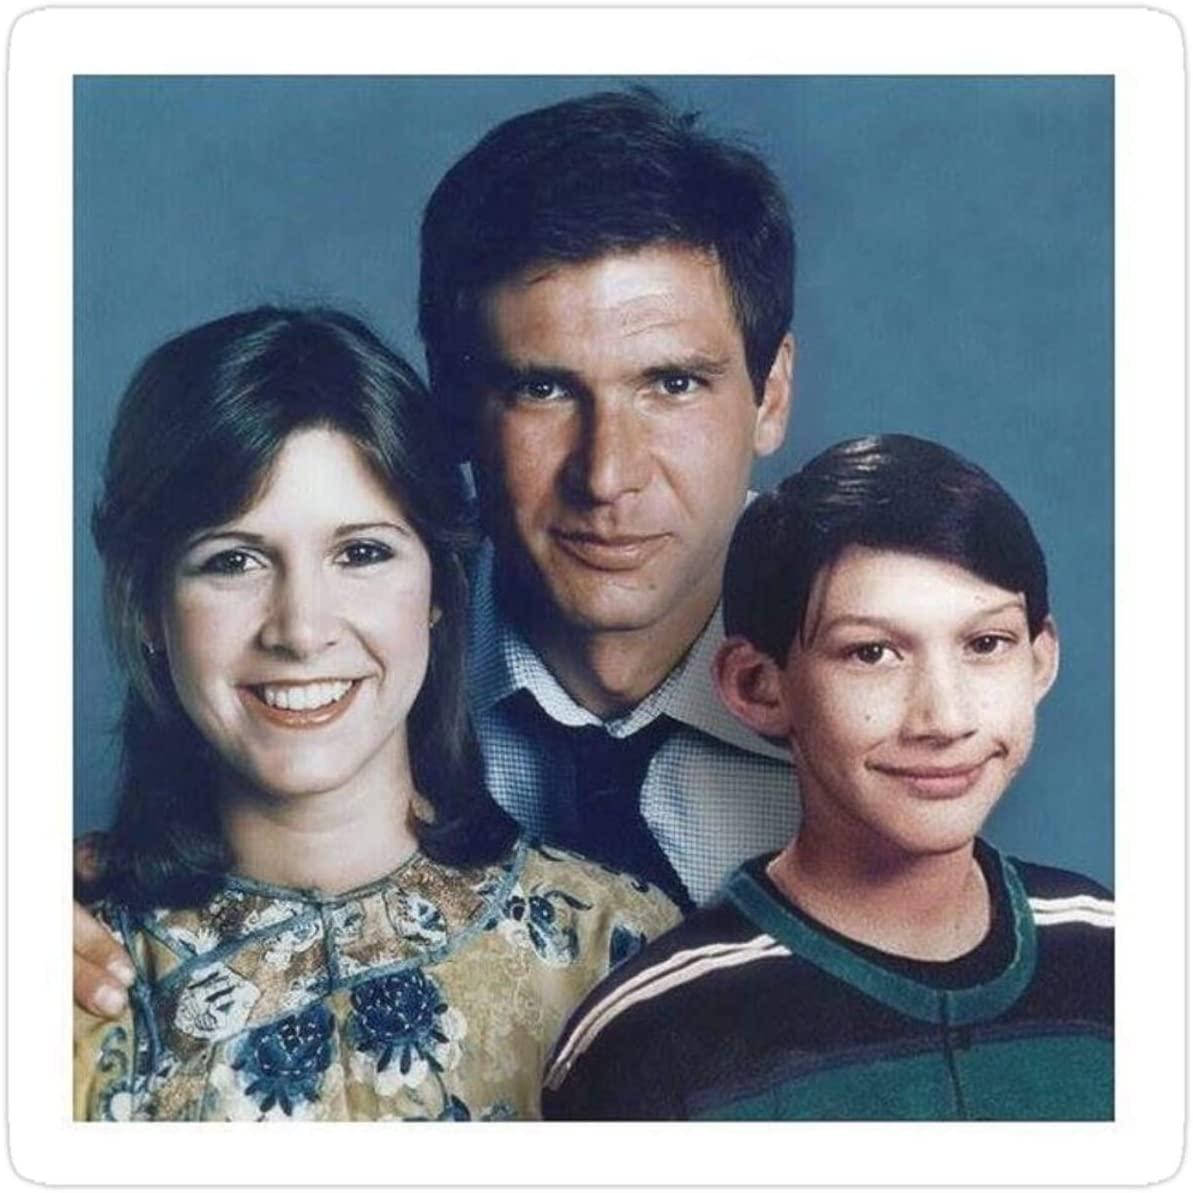 Stickers Solo Family Portrait Books (3 Pcs/Pack) Car Vinyl 3x4 Inch Decals